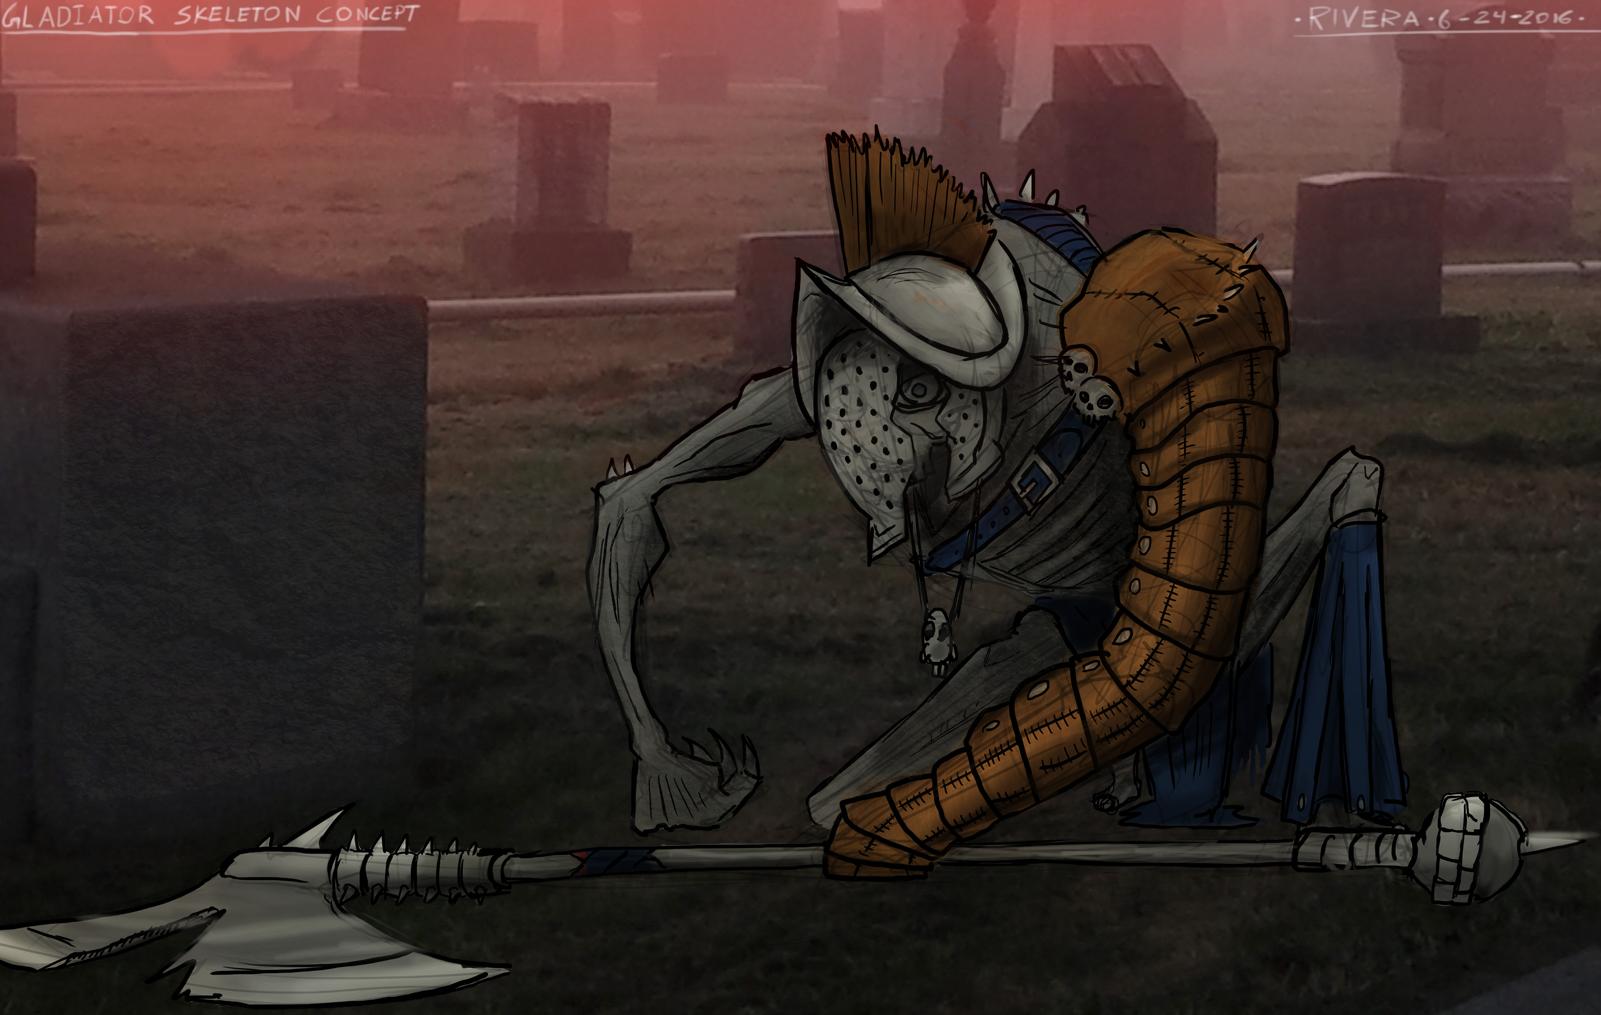 Skeleton Gladiator concept